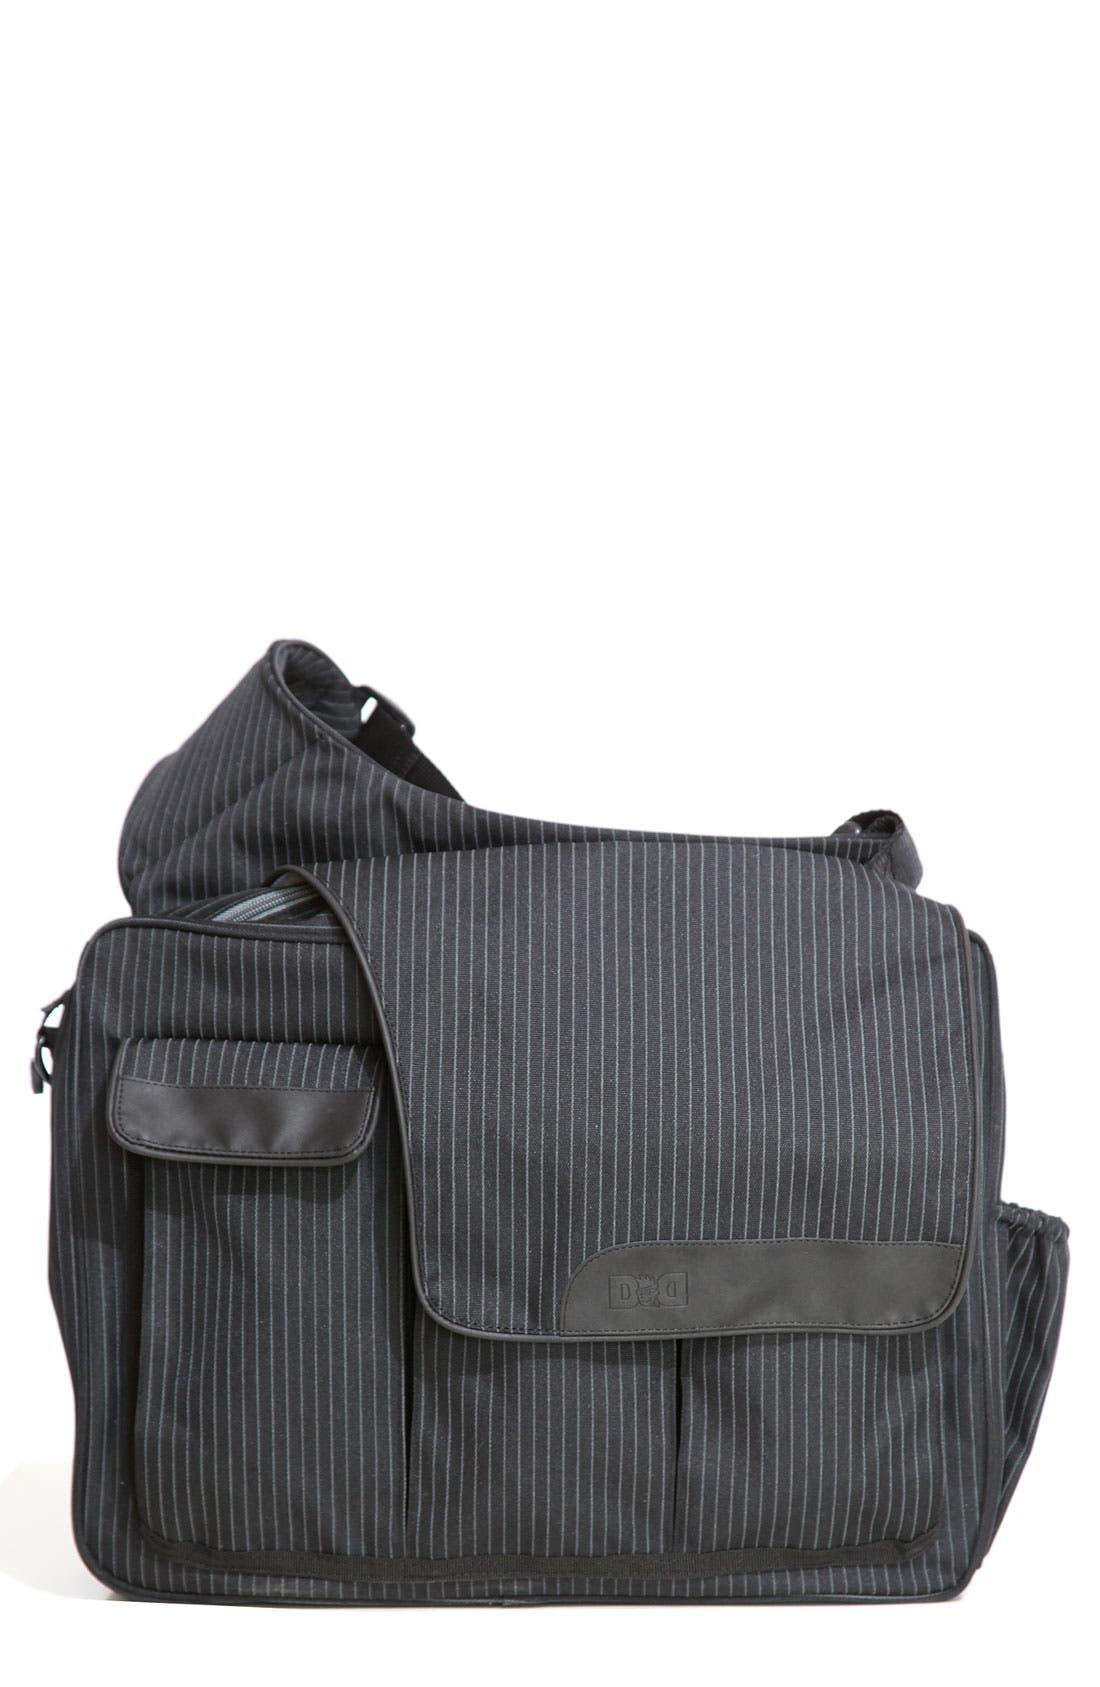 DIAPER DUDE 'Messenger II' Diaper Bag, Main, color, 001